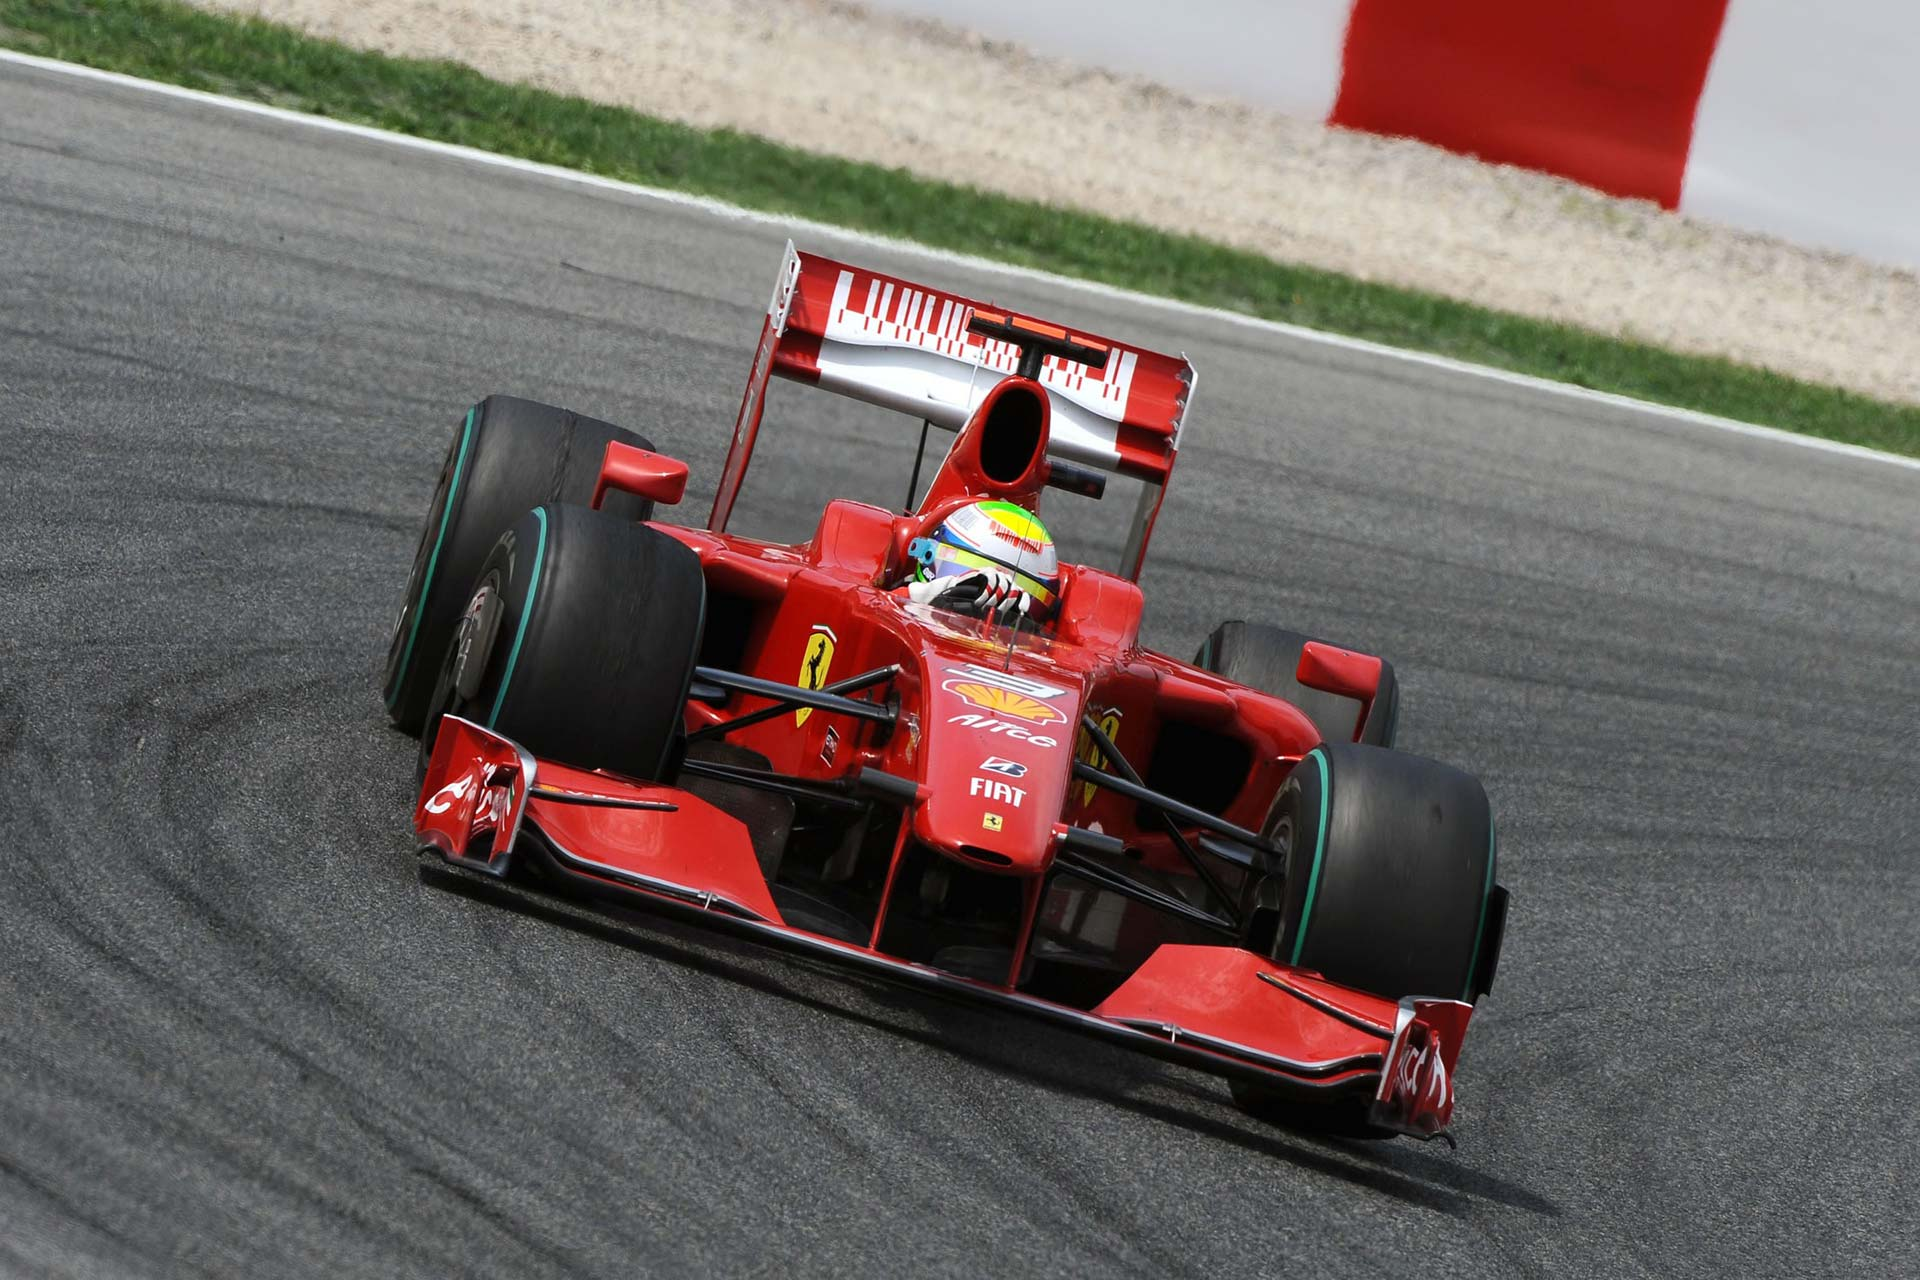 Belgian Grand Prix: Great Success of Alonso